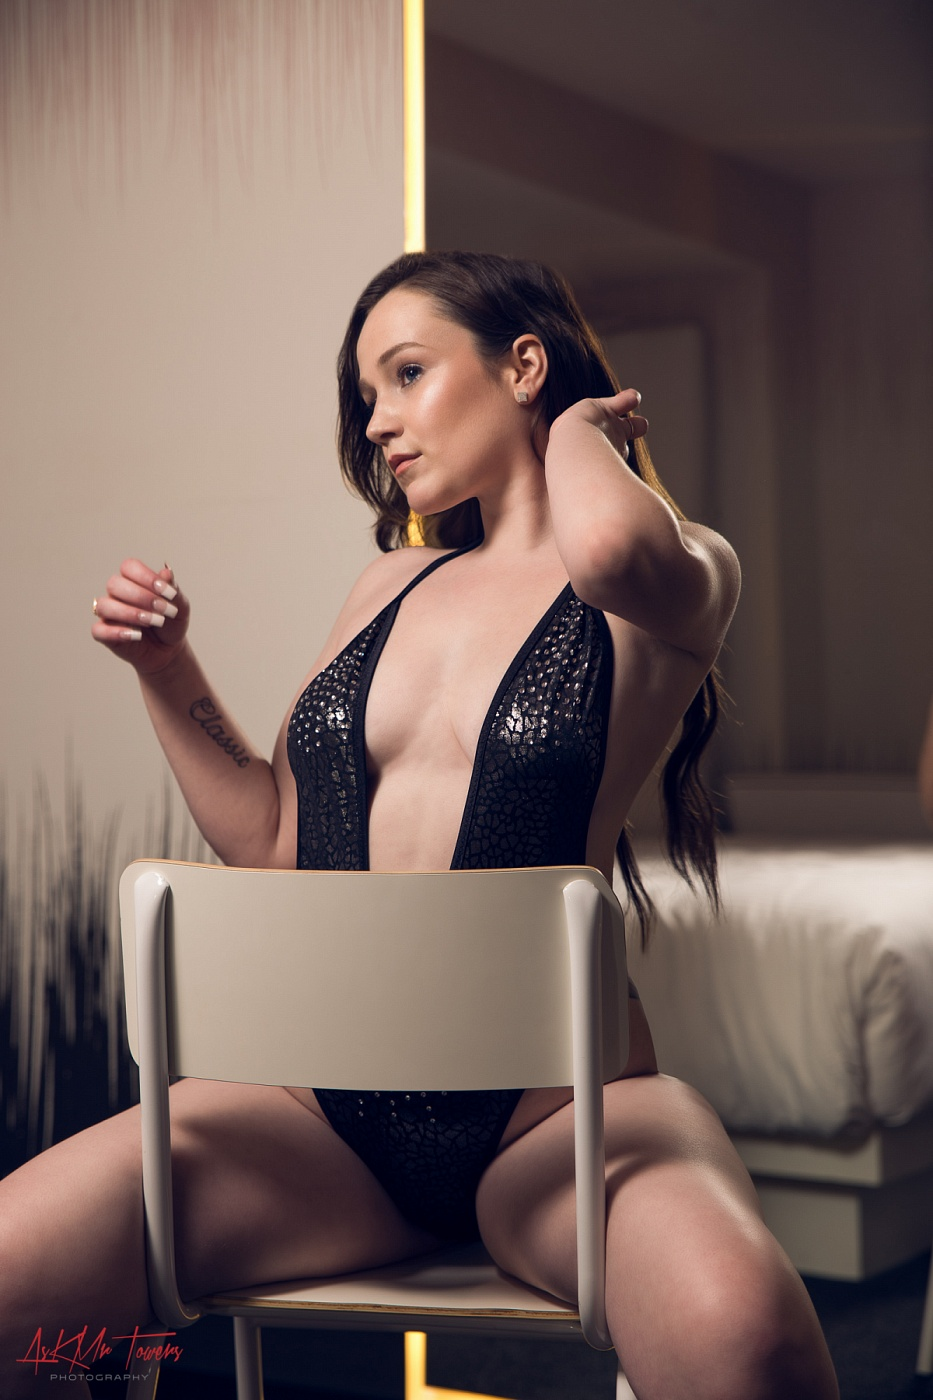 Nicolette Diamond